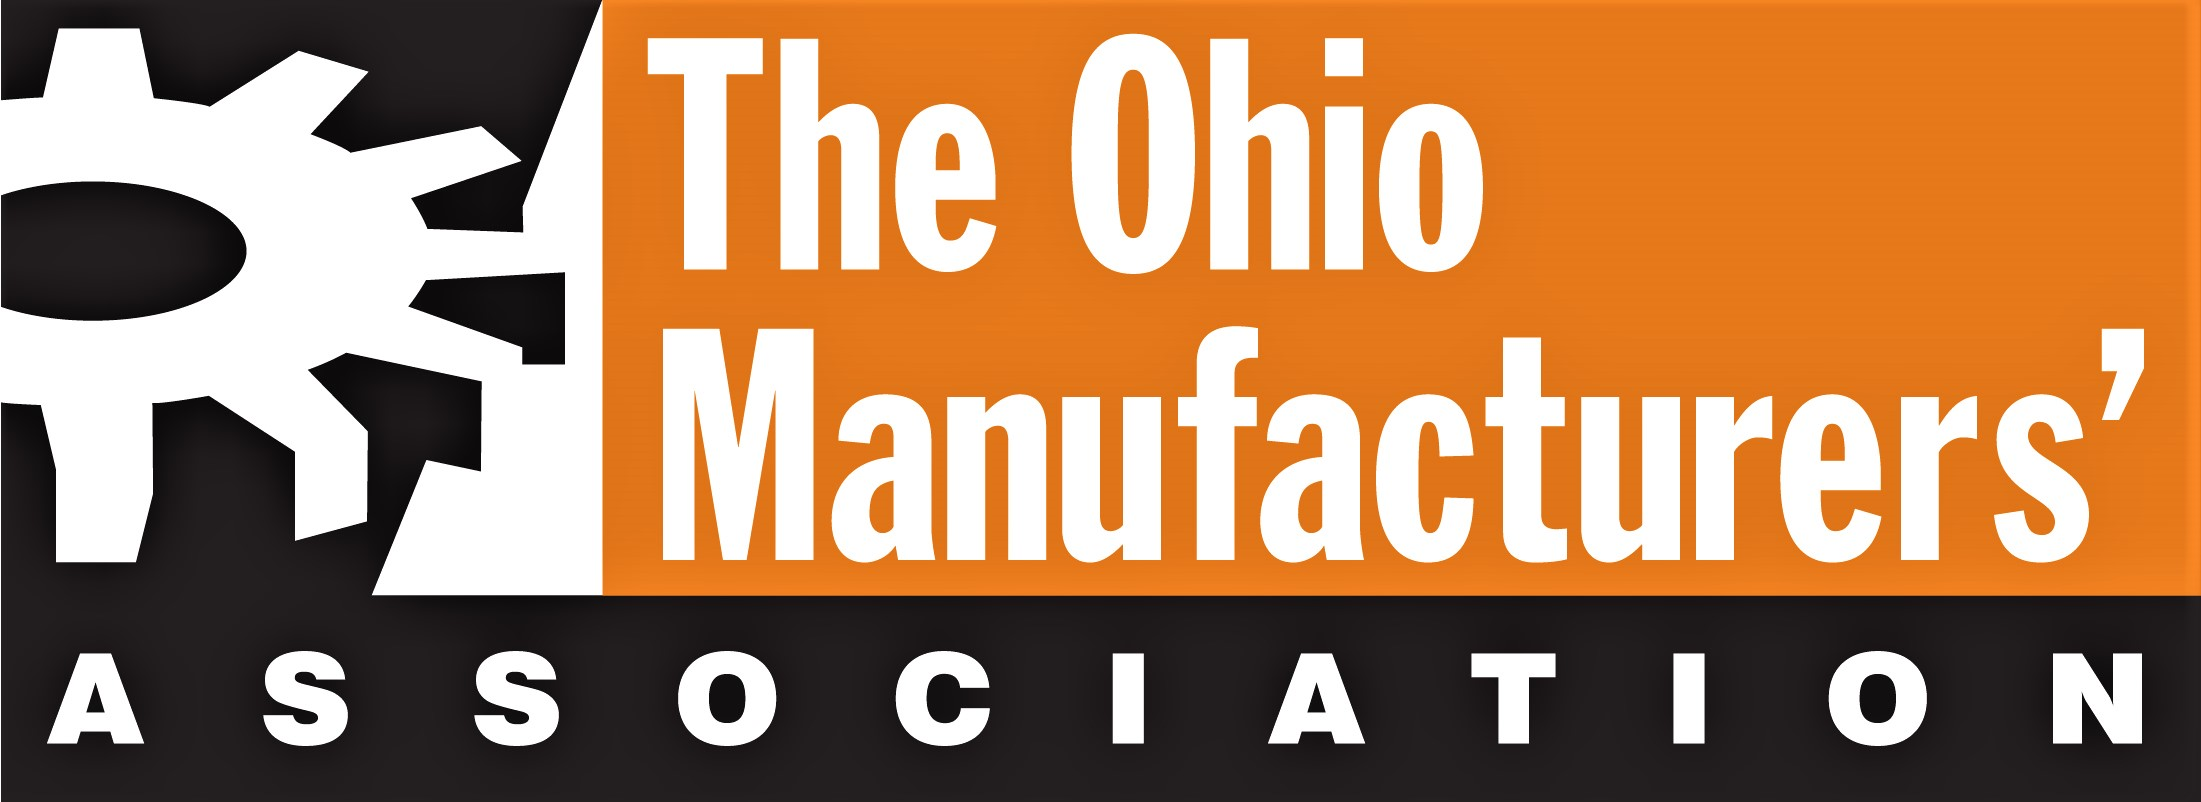 Ohio Manufacturers Association logo